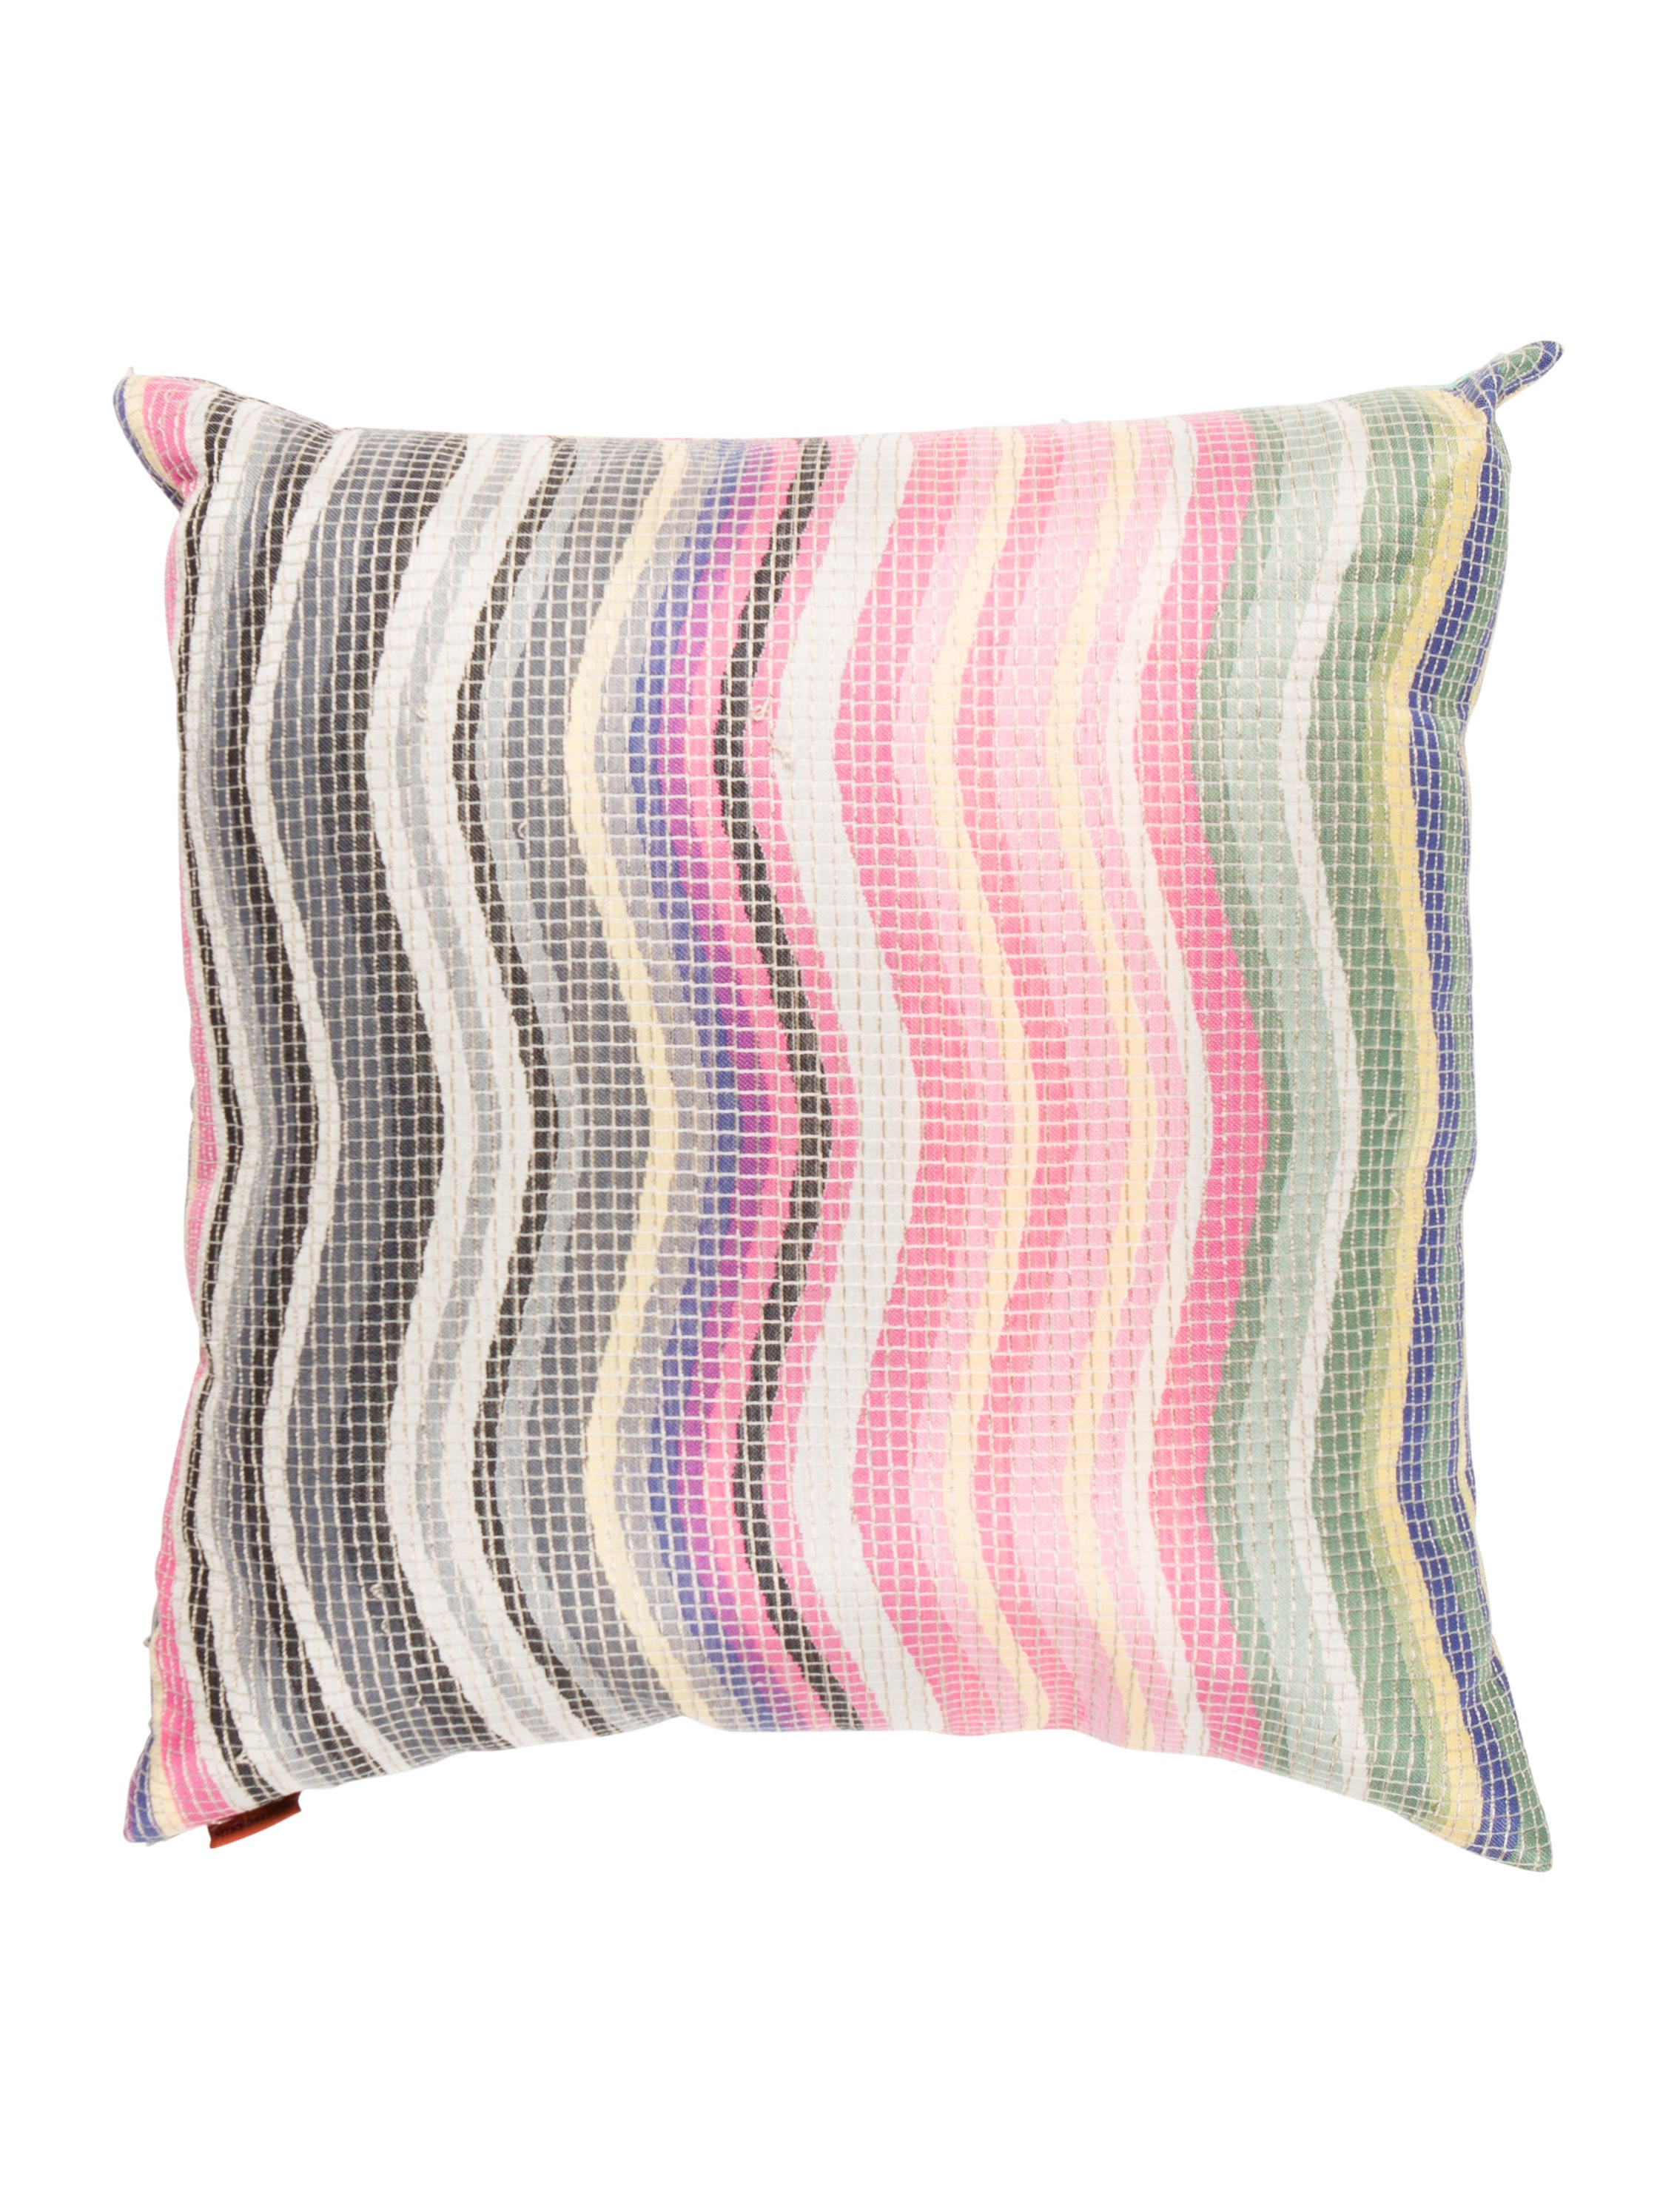 img josephine missoni missonijosephine tessuti pillow pillows products